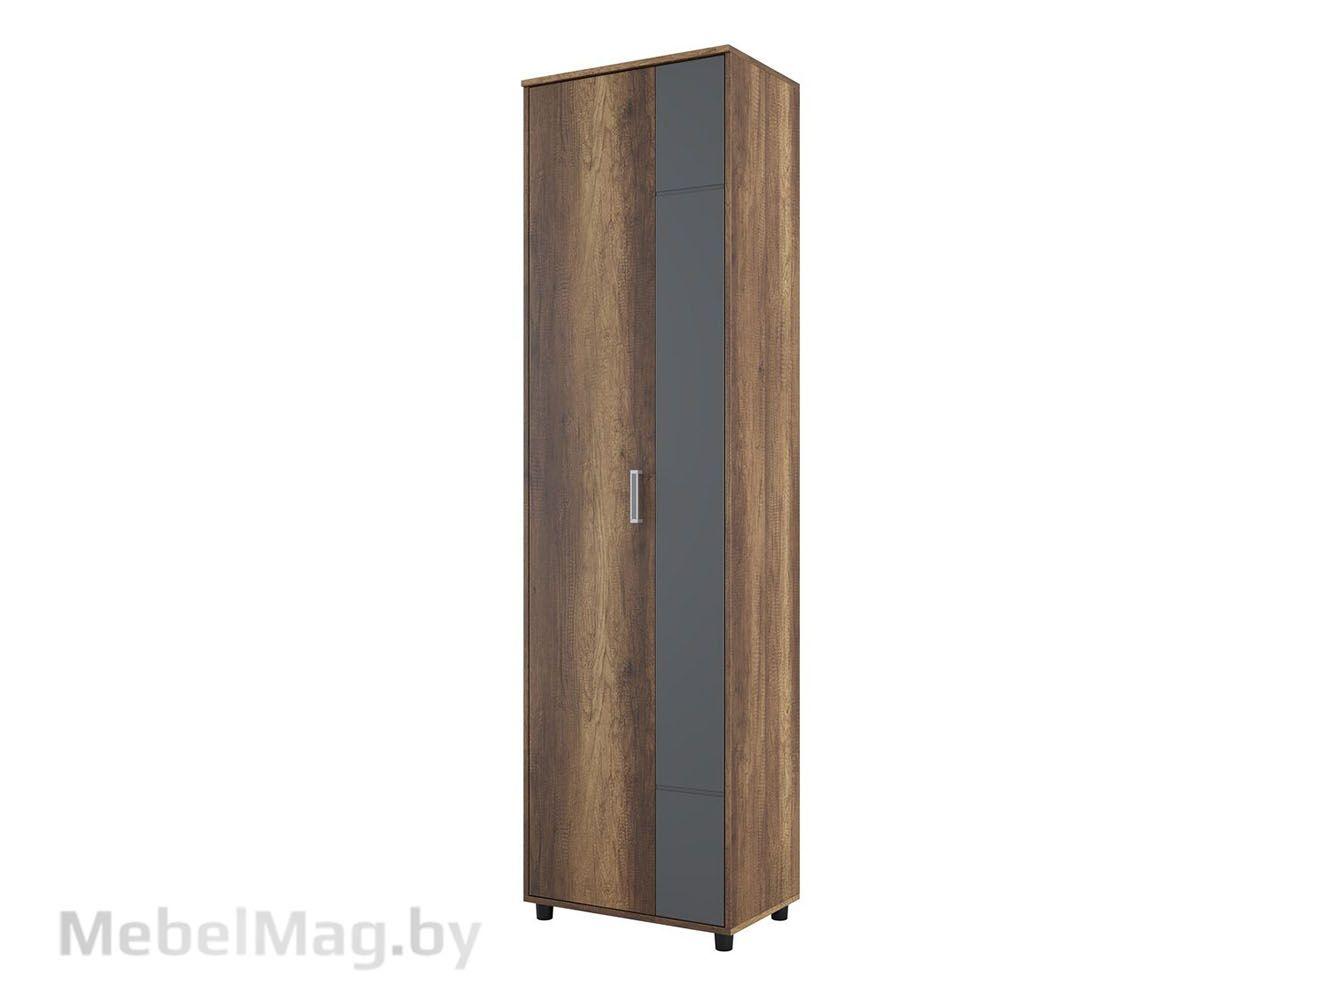 Шкаф двухстворчатый Дуб Каньон/МДФ серый - Коллекция Визит 1